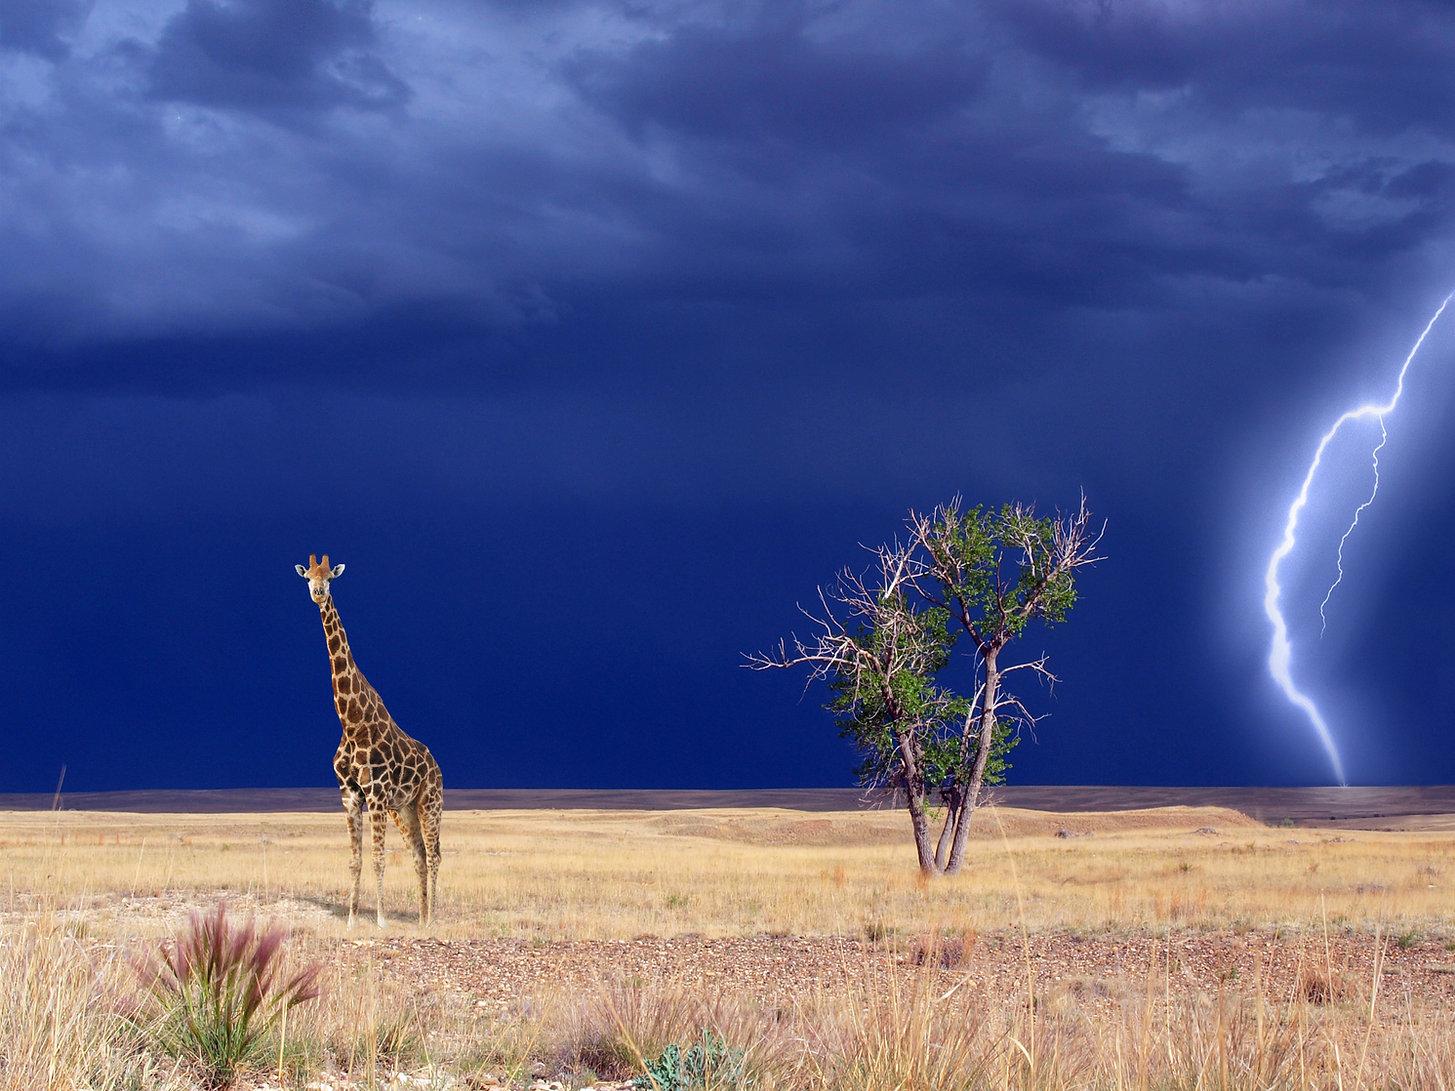 giraffe-in-the-landscape-woth-lightning-